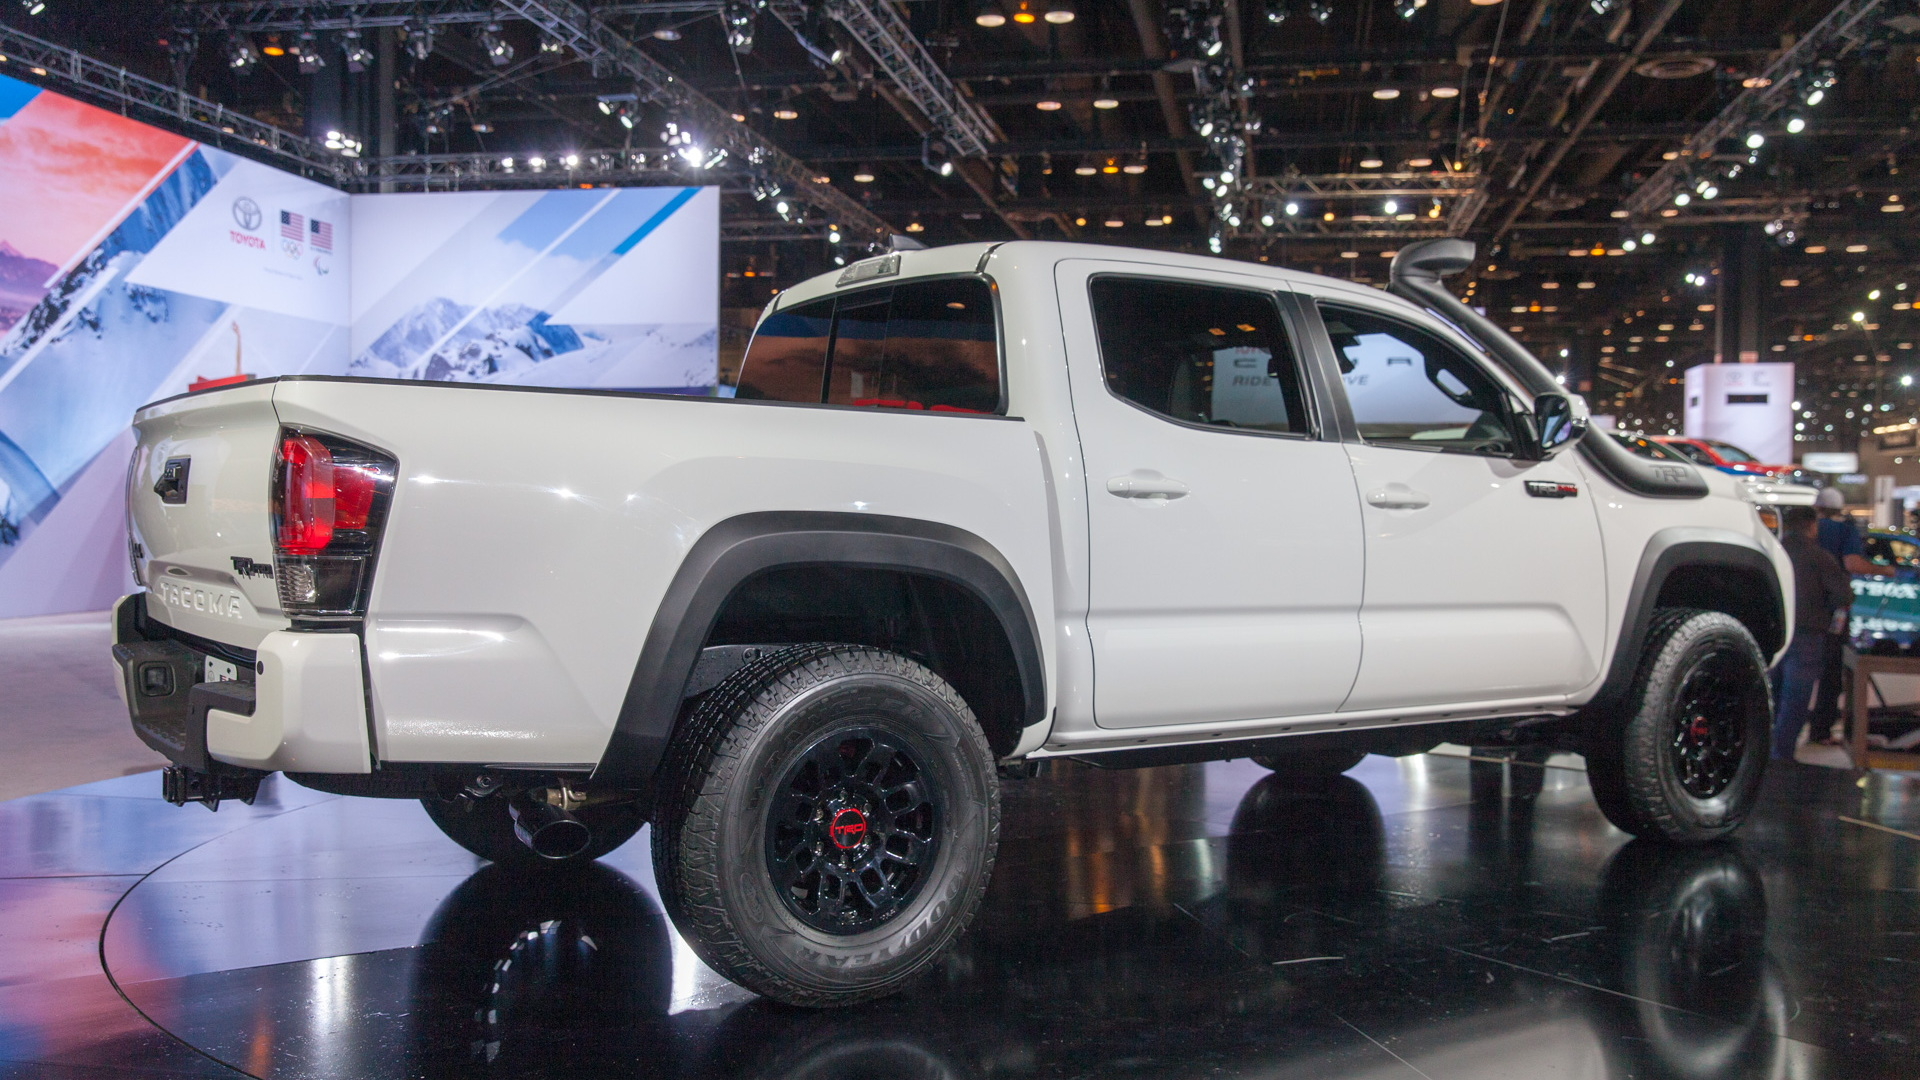 2019 Toyota Tacoma TRD Pro, 2018 Chicago Auto Show